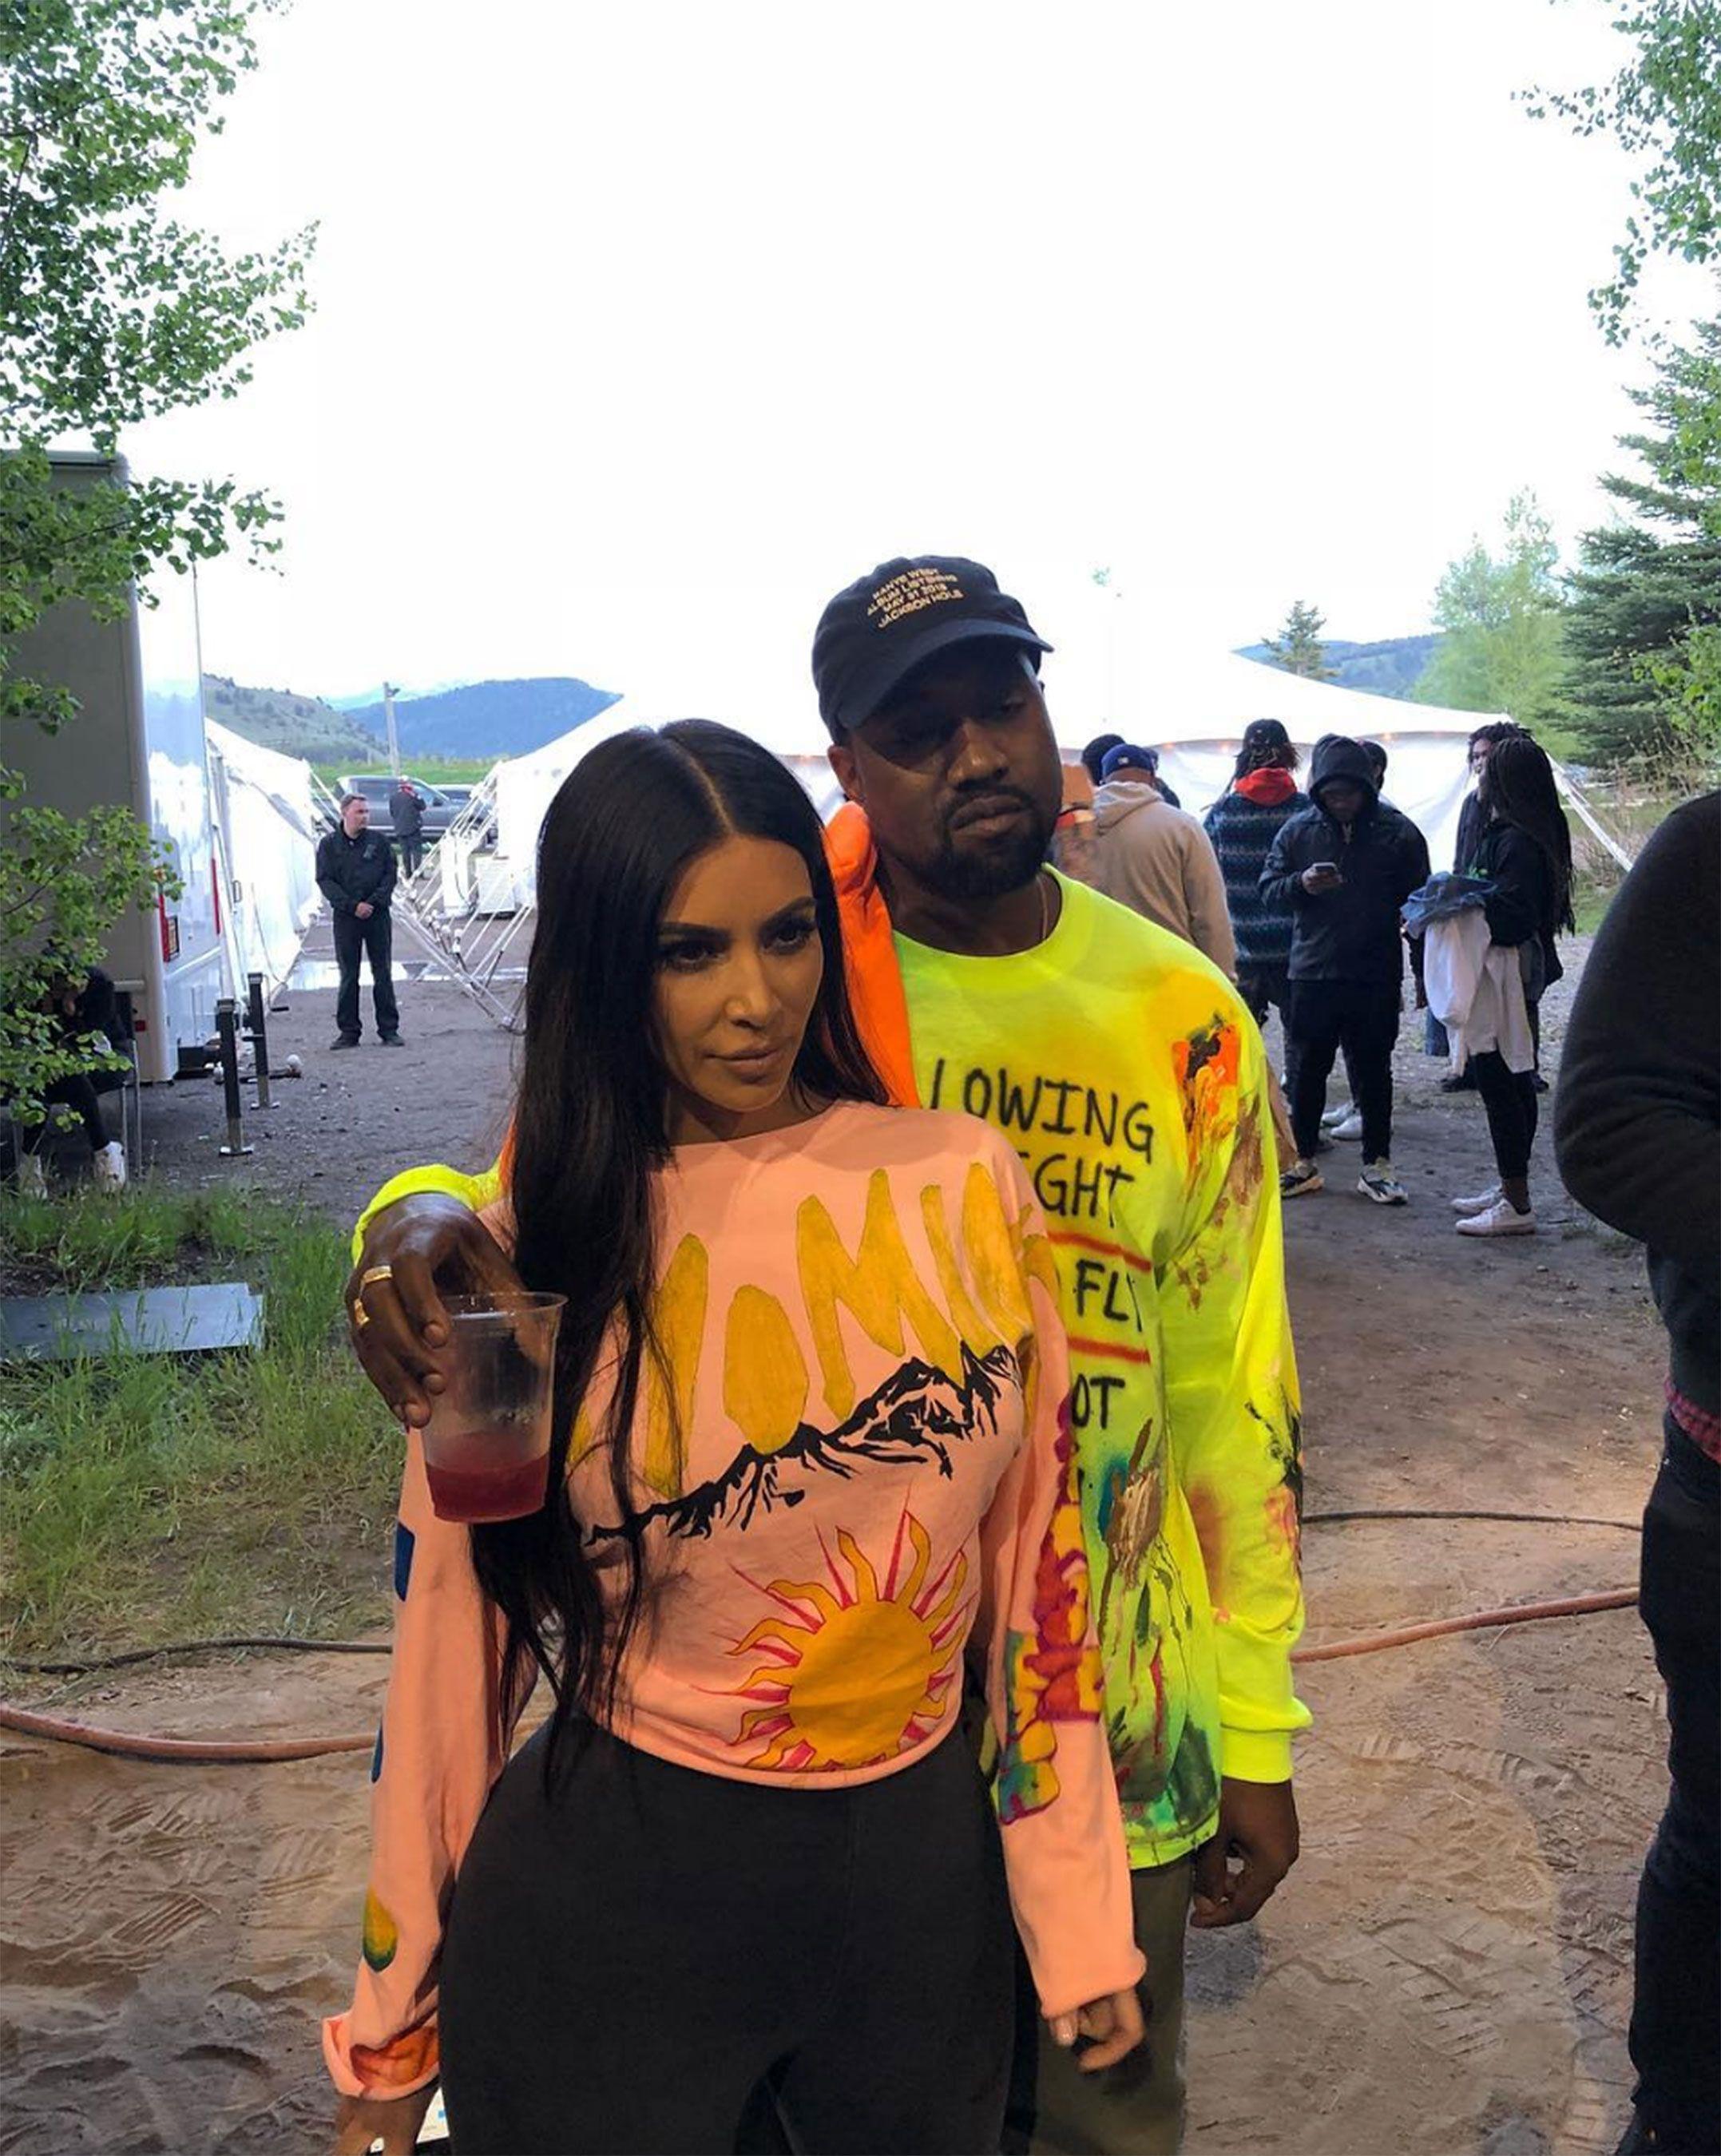 Kanye West Raps About Kim Kardashian West Leaving Him Bipolar Disorder In 7 Track Album Ye Kim Kardashian And Kanye Kim Kardashian Kanye West Kanye West And Kim